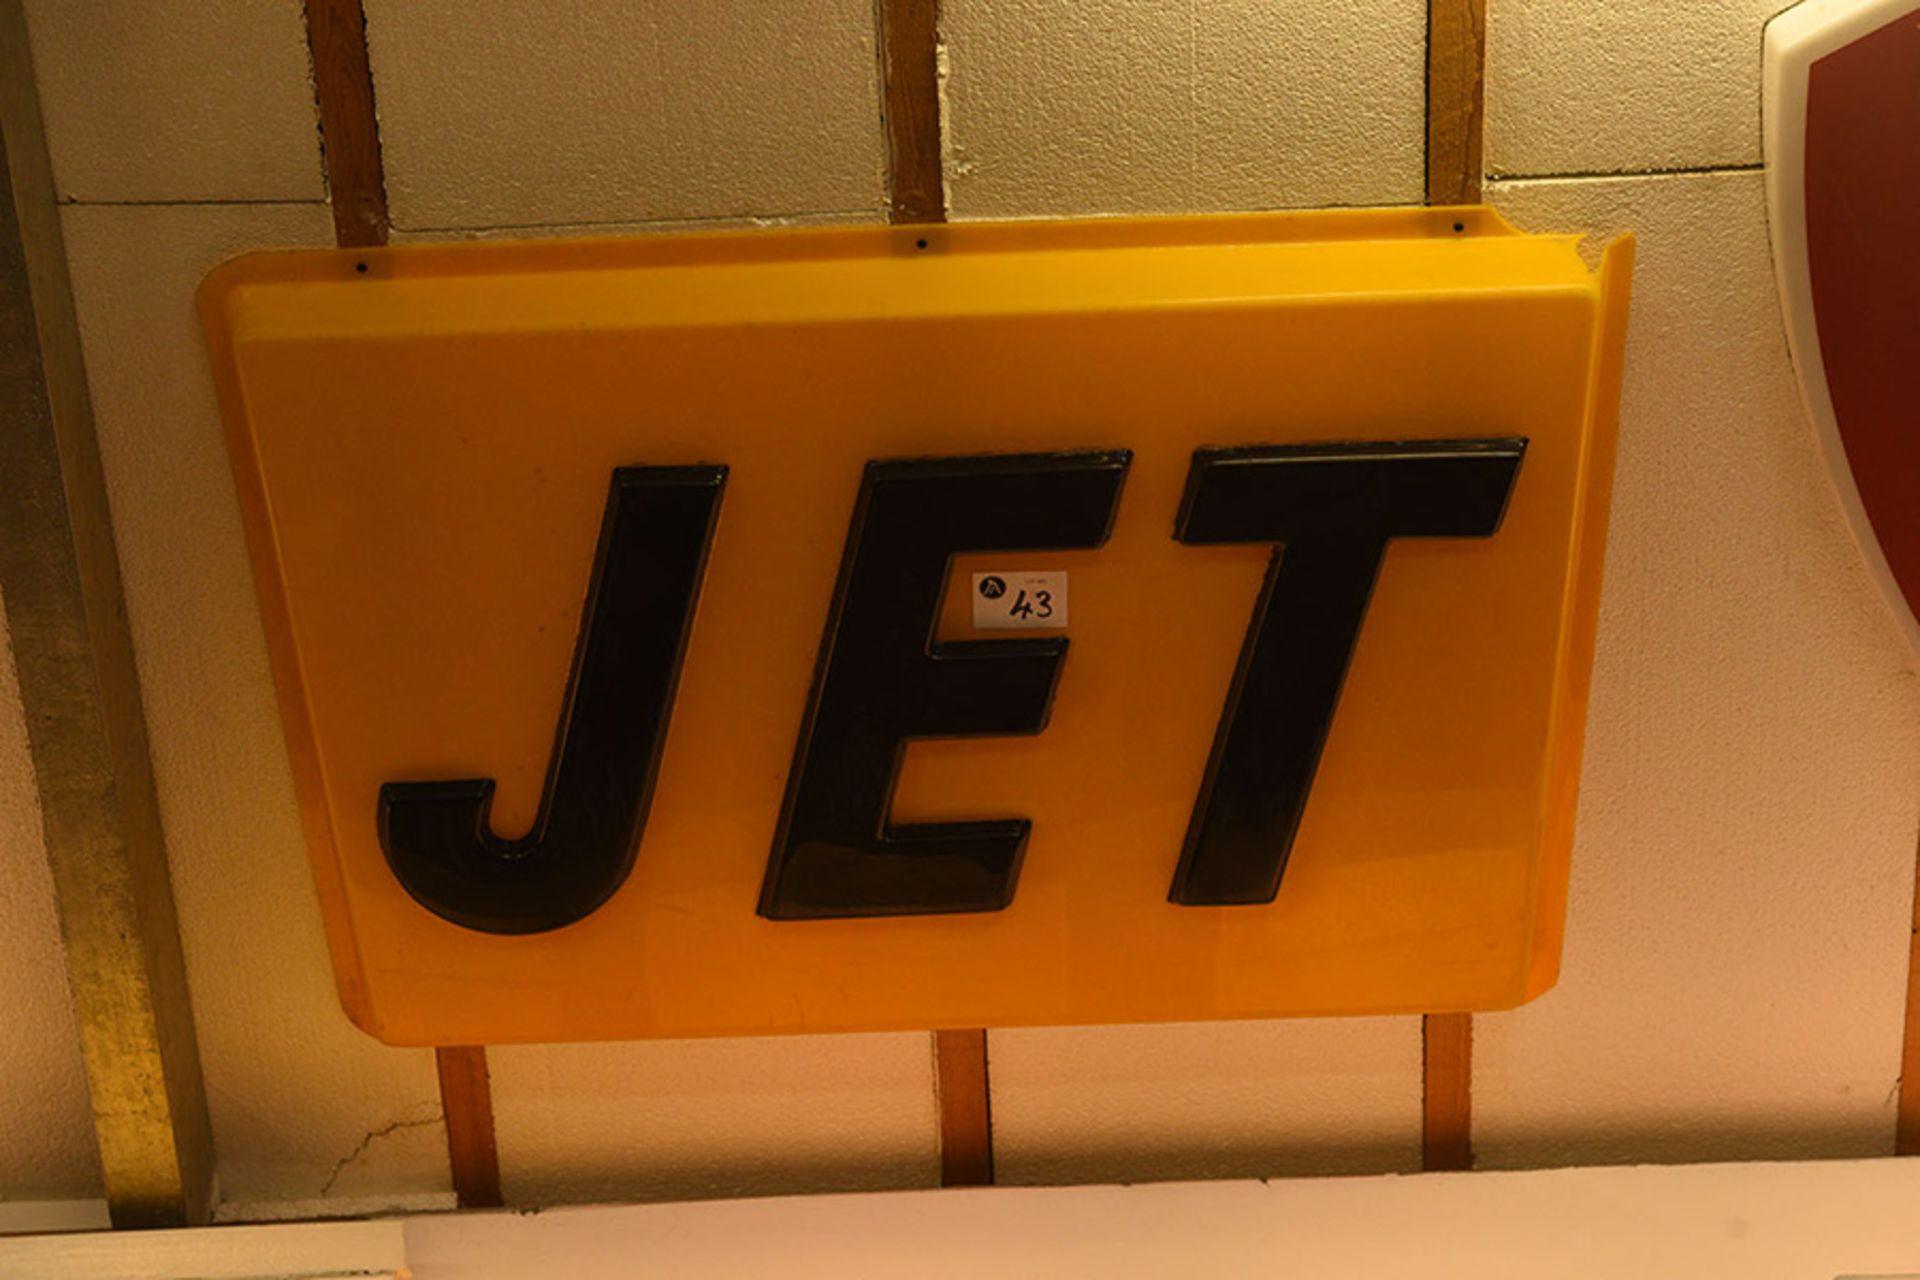 Lot 43 - Jet Plastic Wall Sign